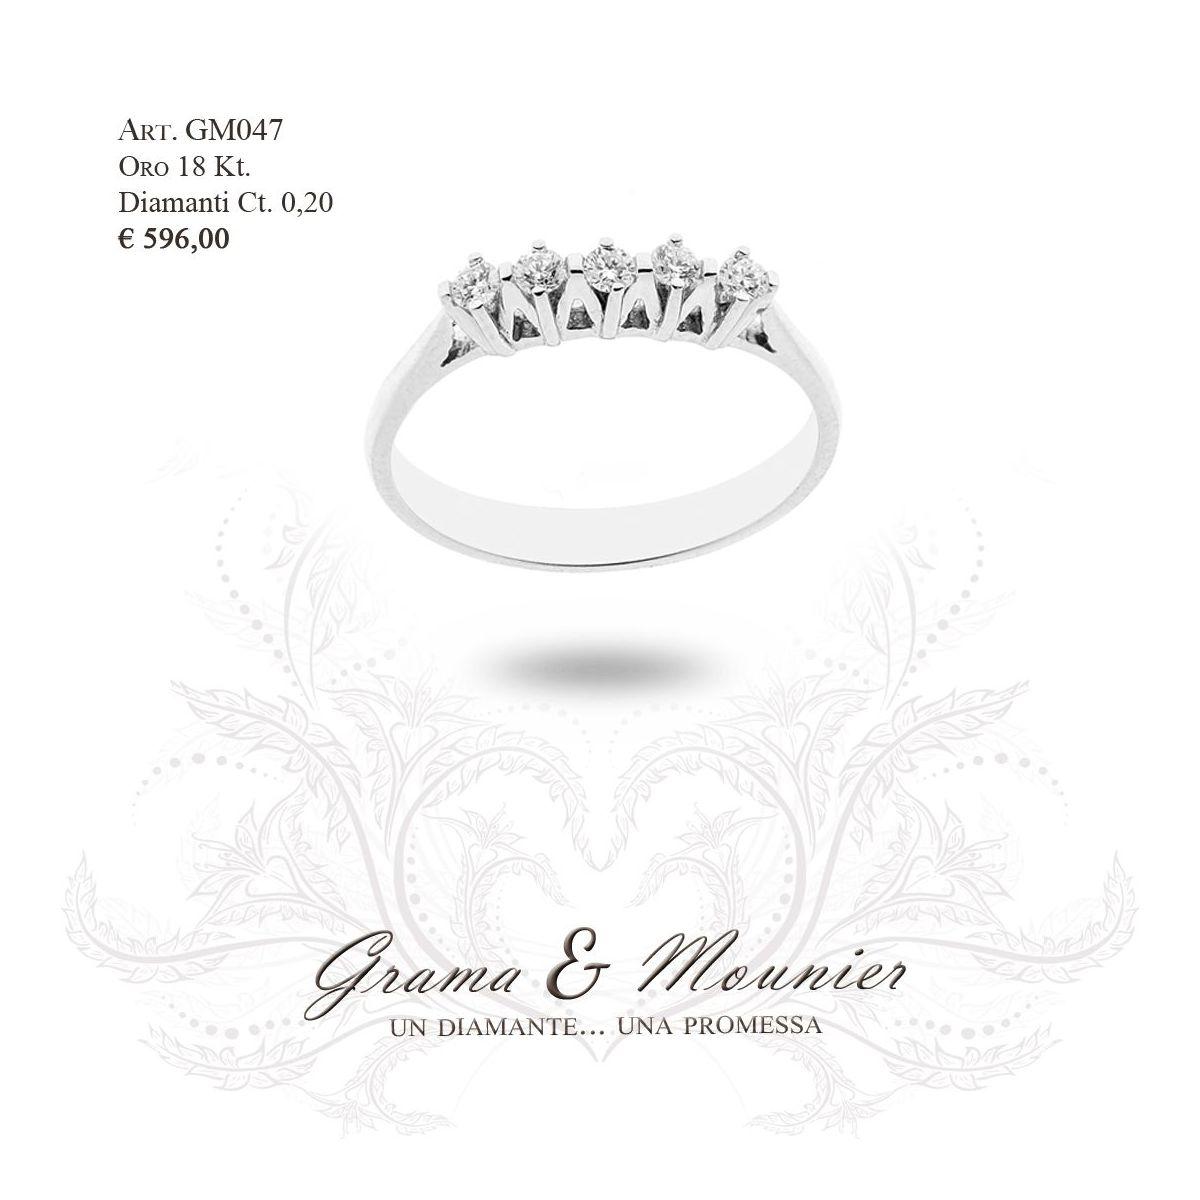 Anello in oro 18Kt. Grama&Mounier Art.GM047